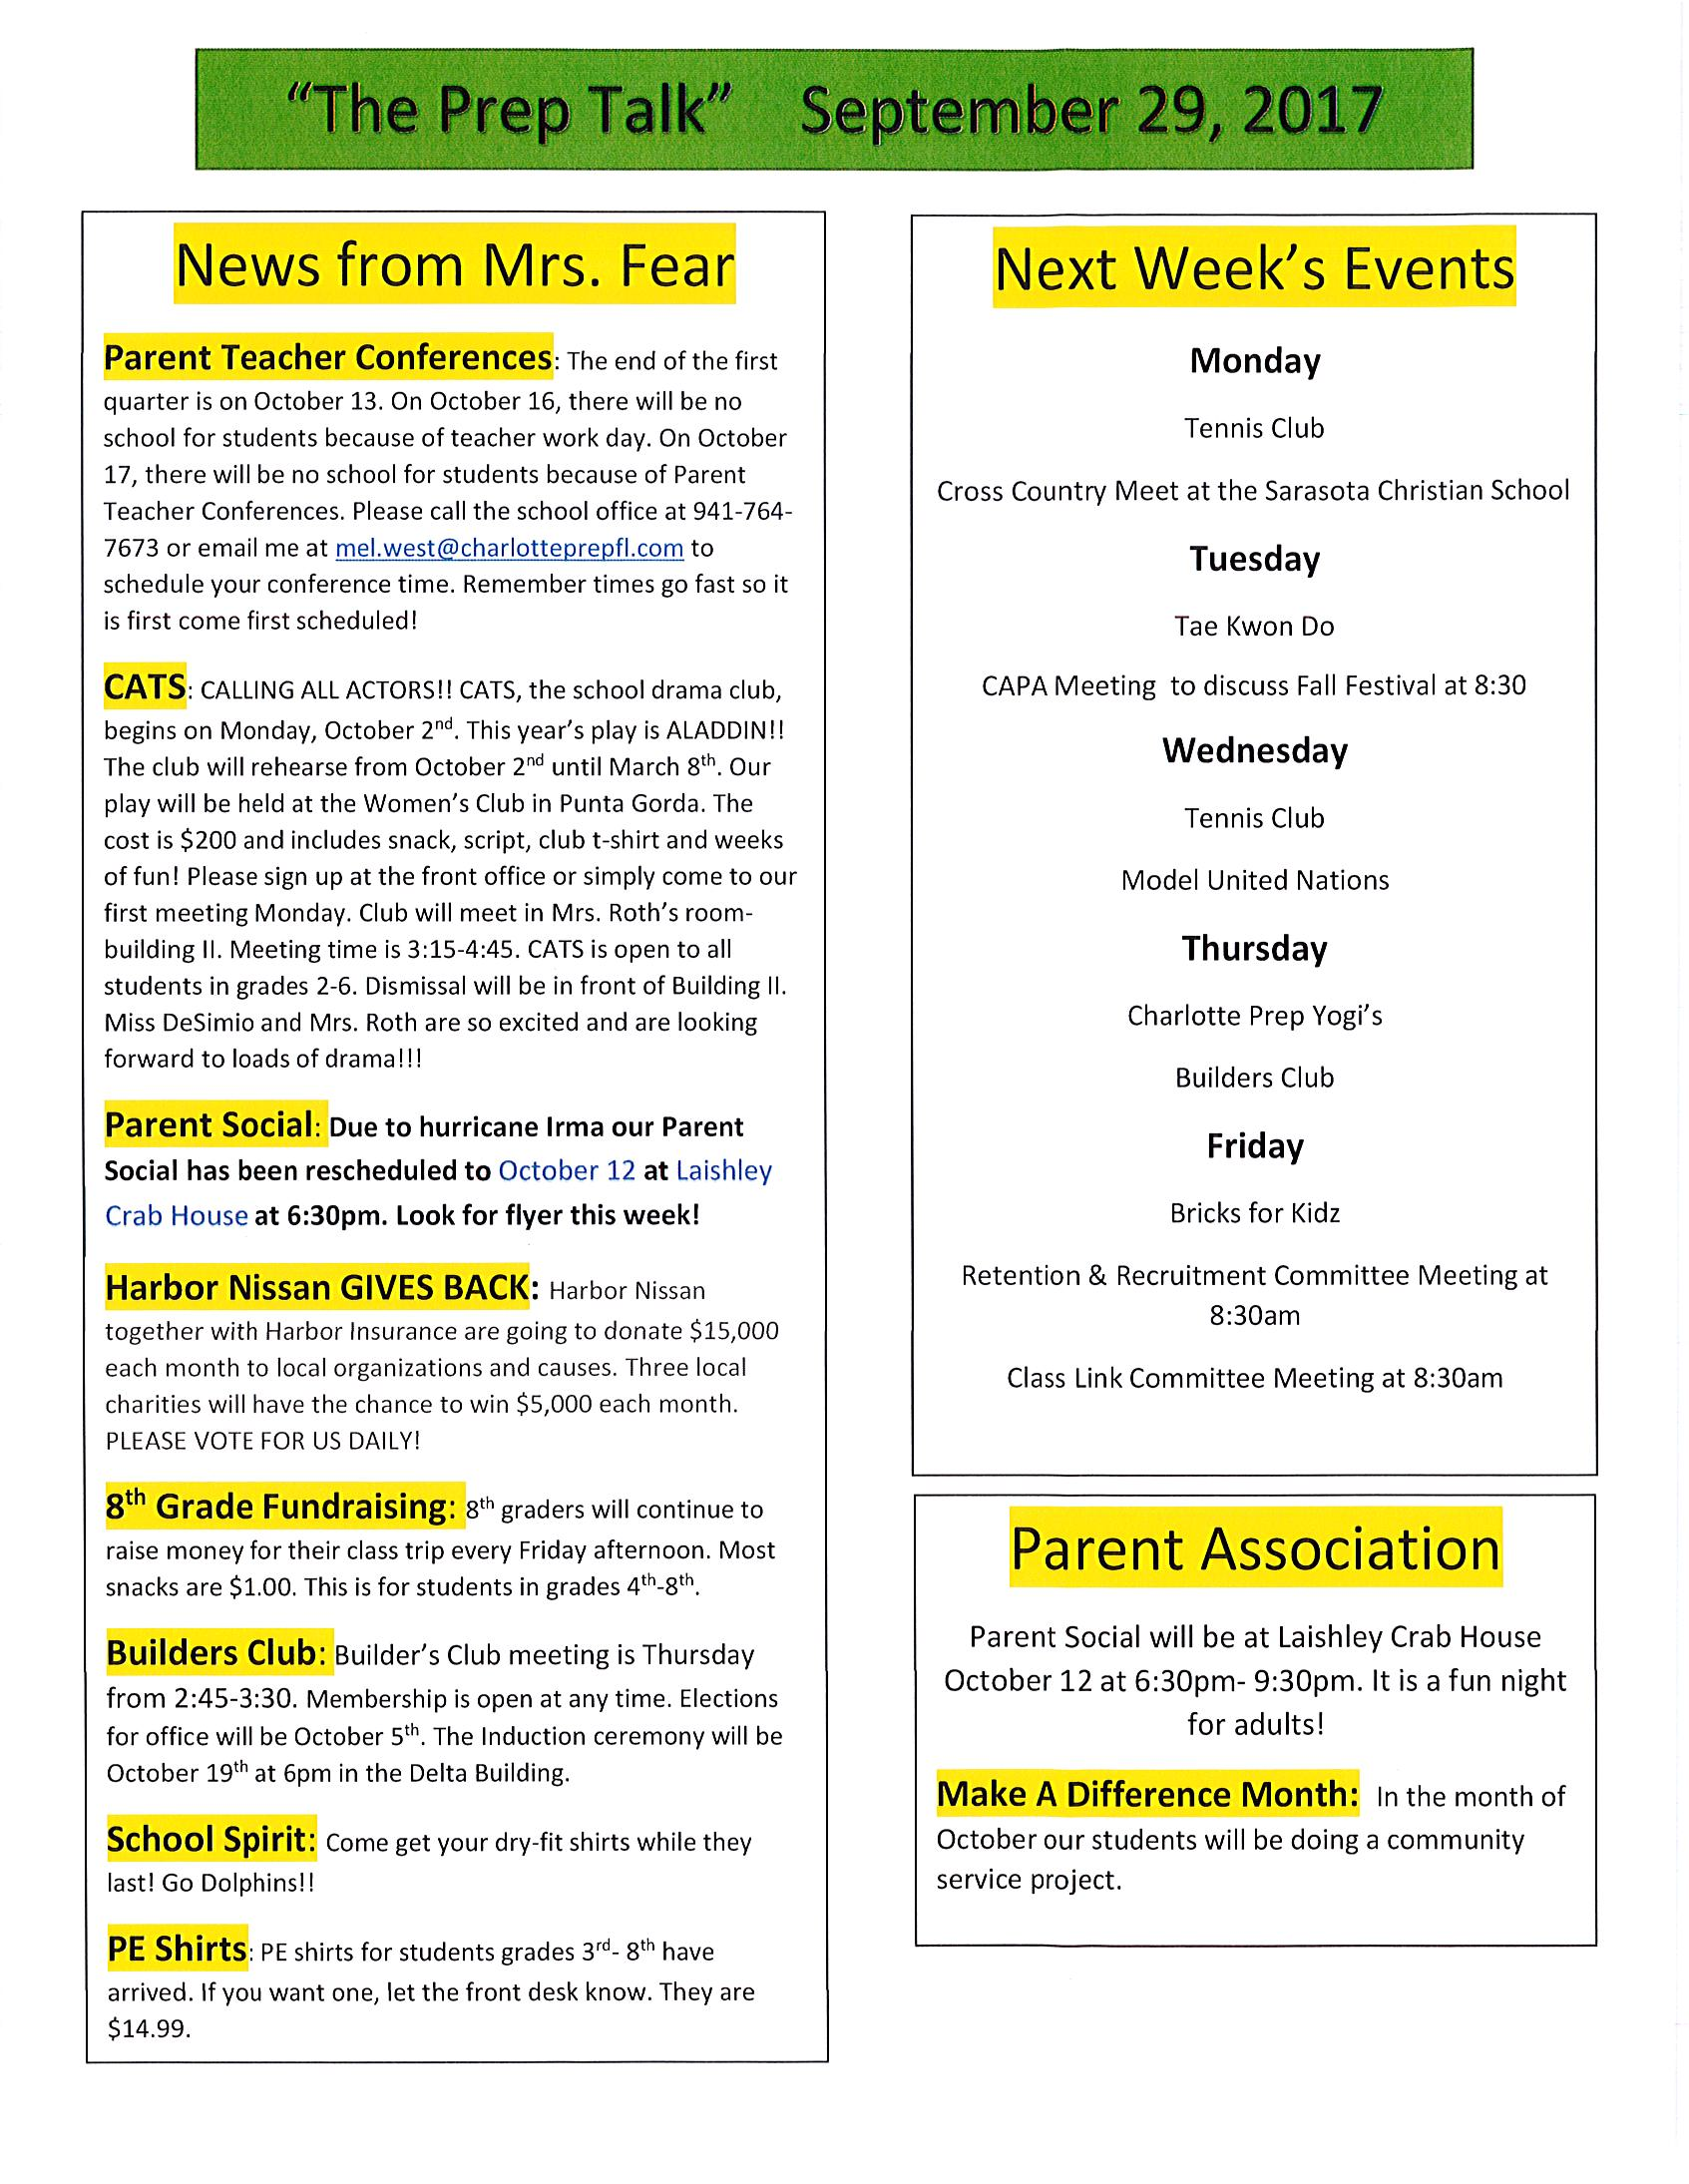 Charlotte Preperatory School Newsletter-Prep Alk